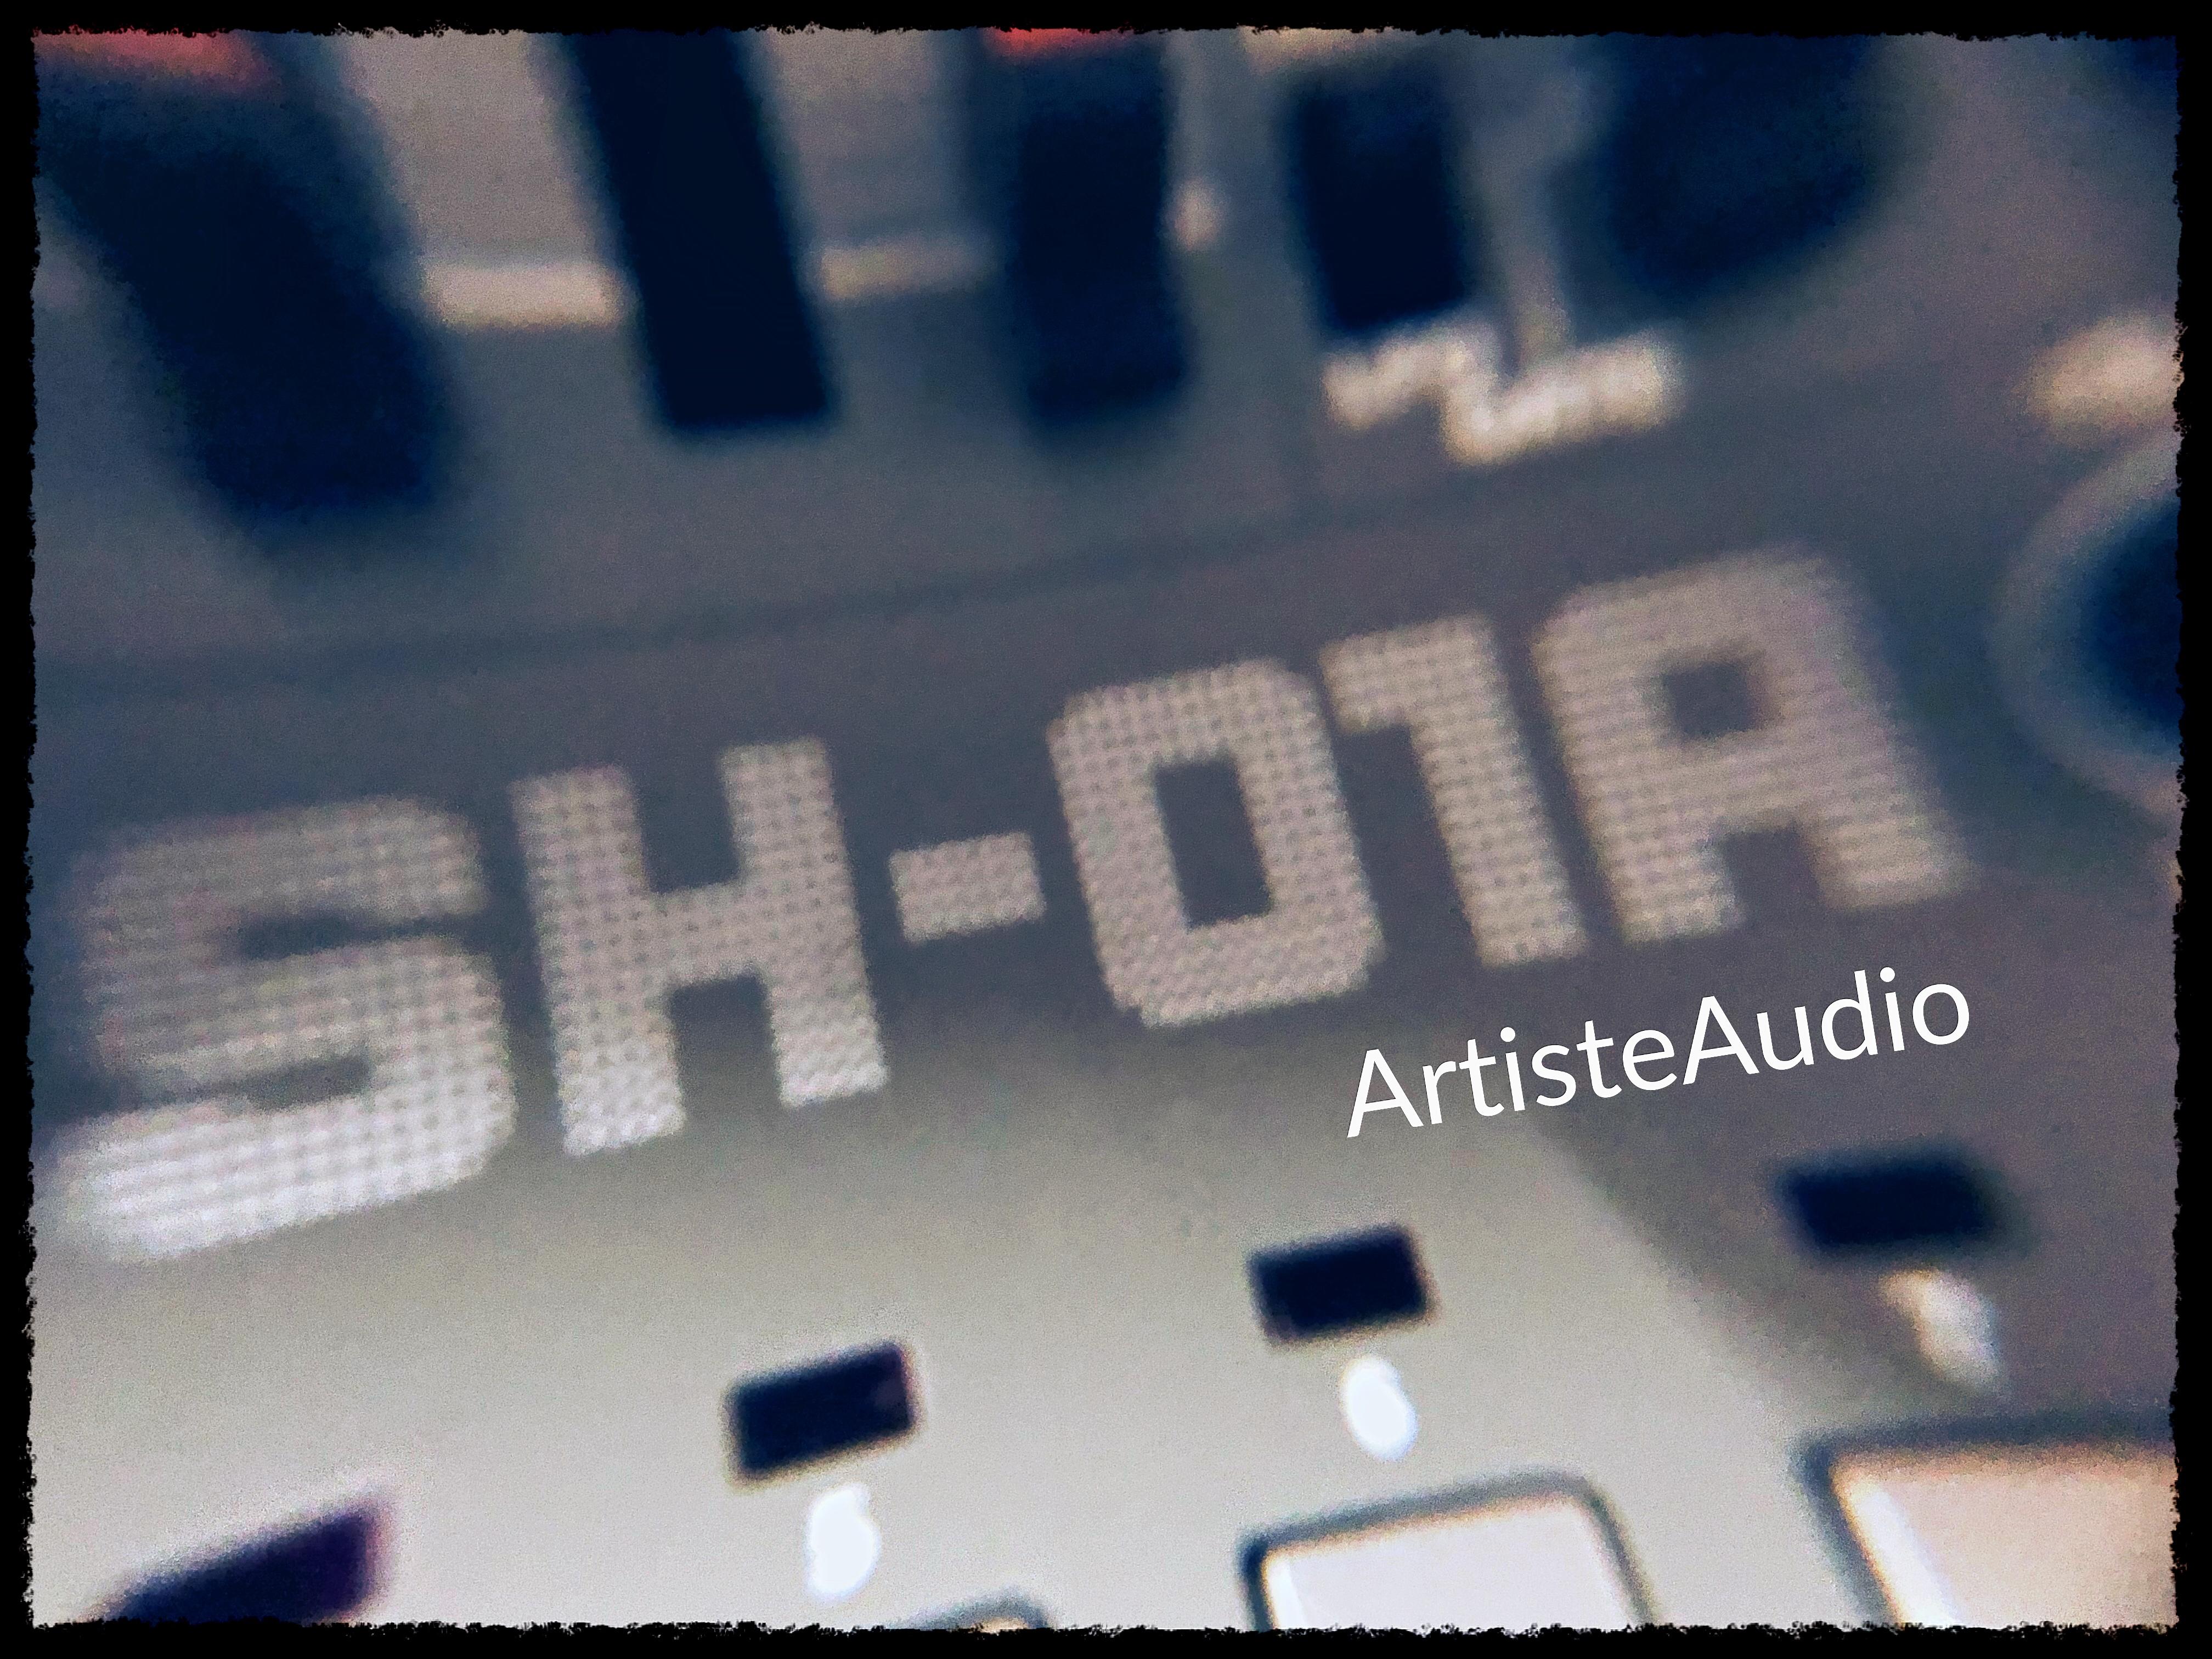 Artiste Audio